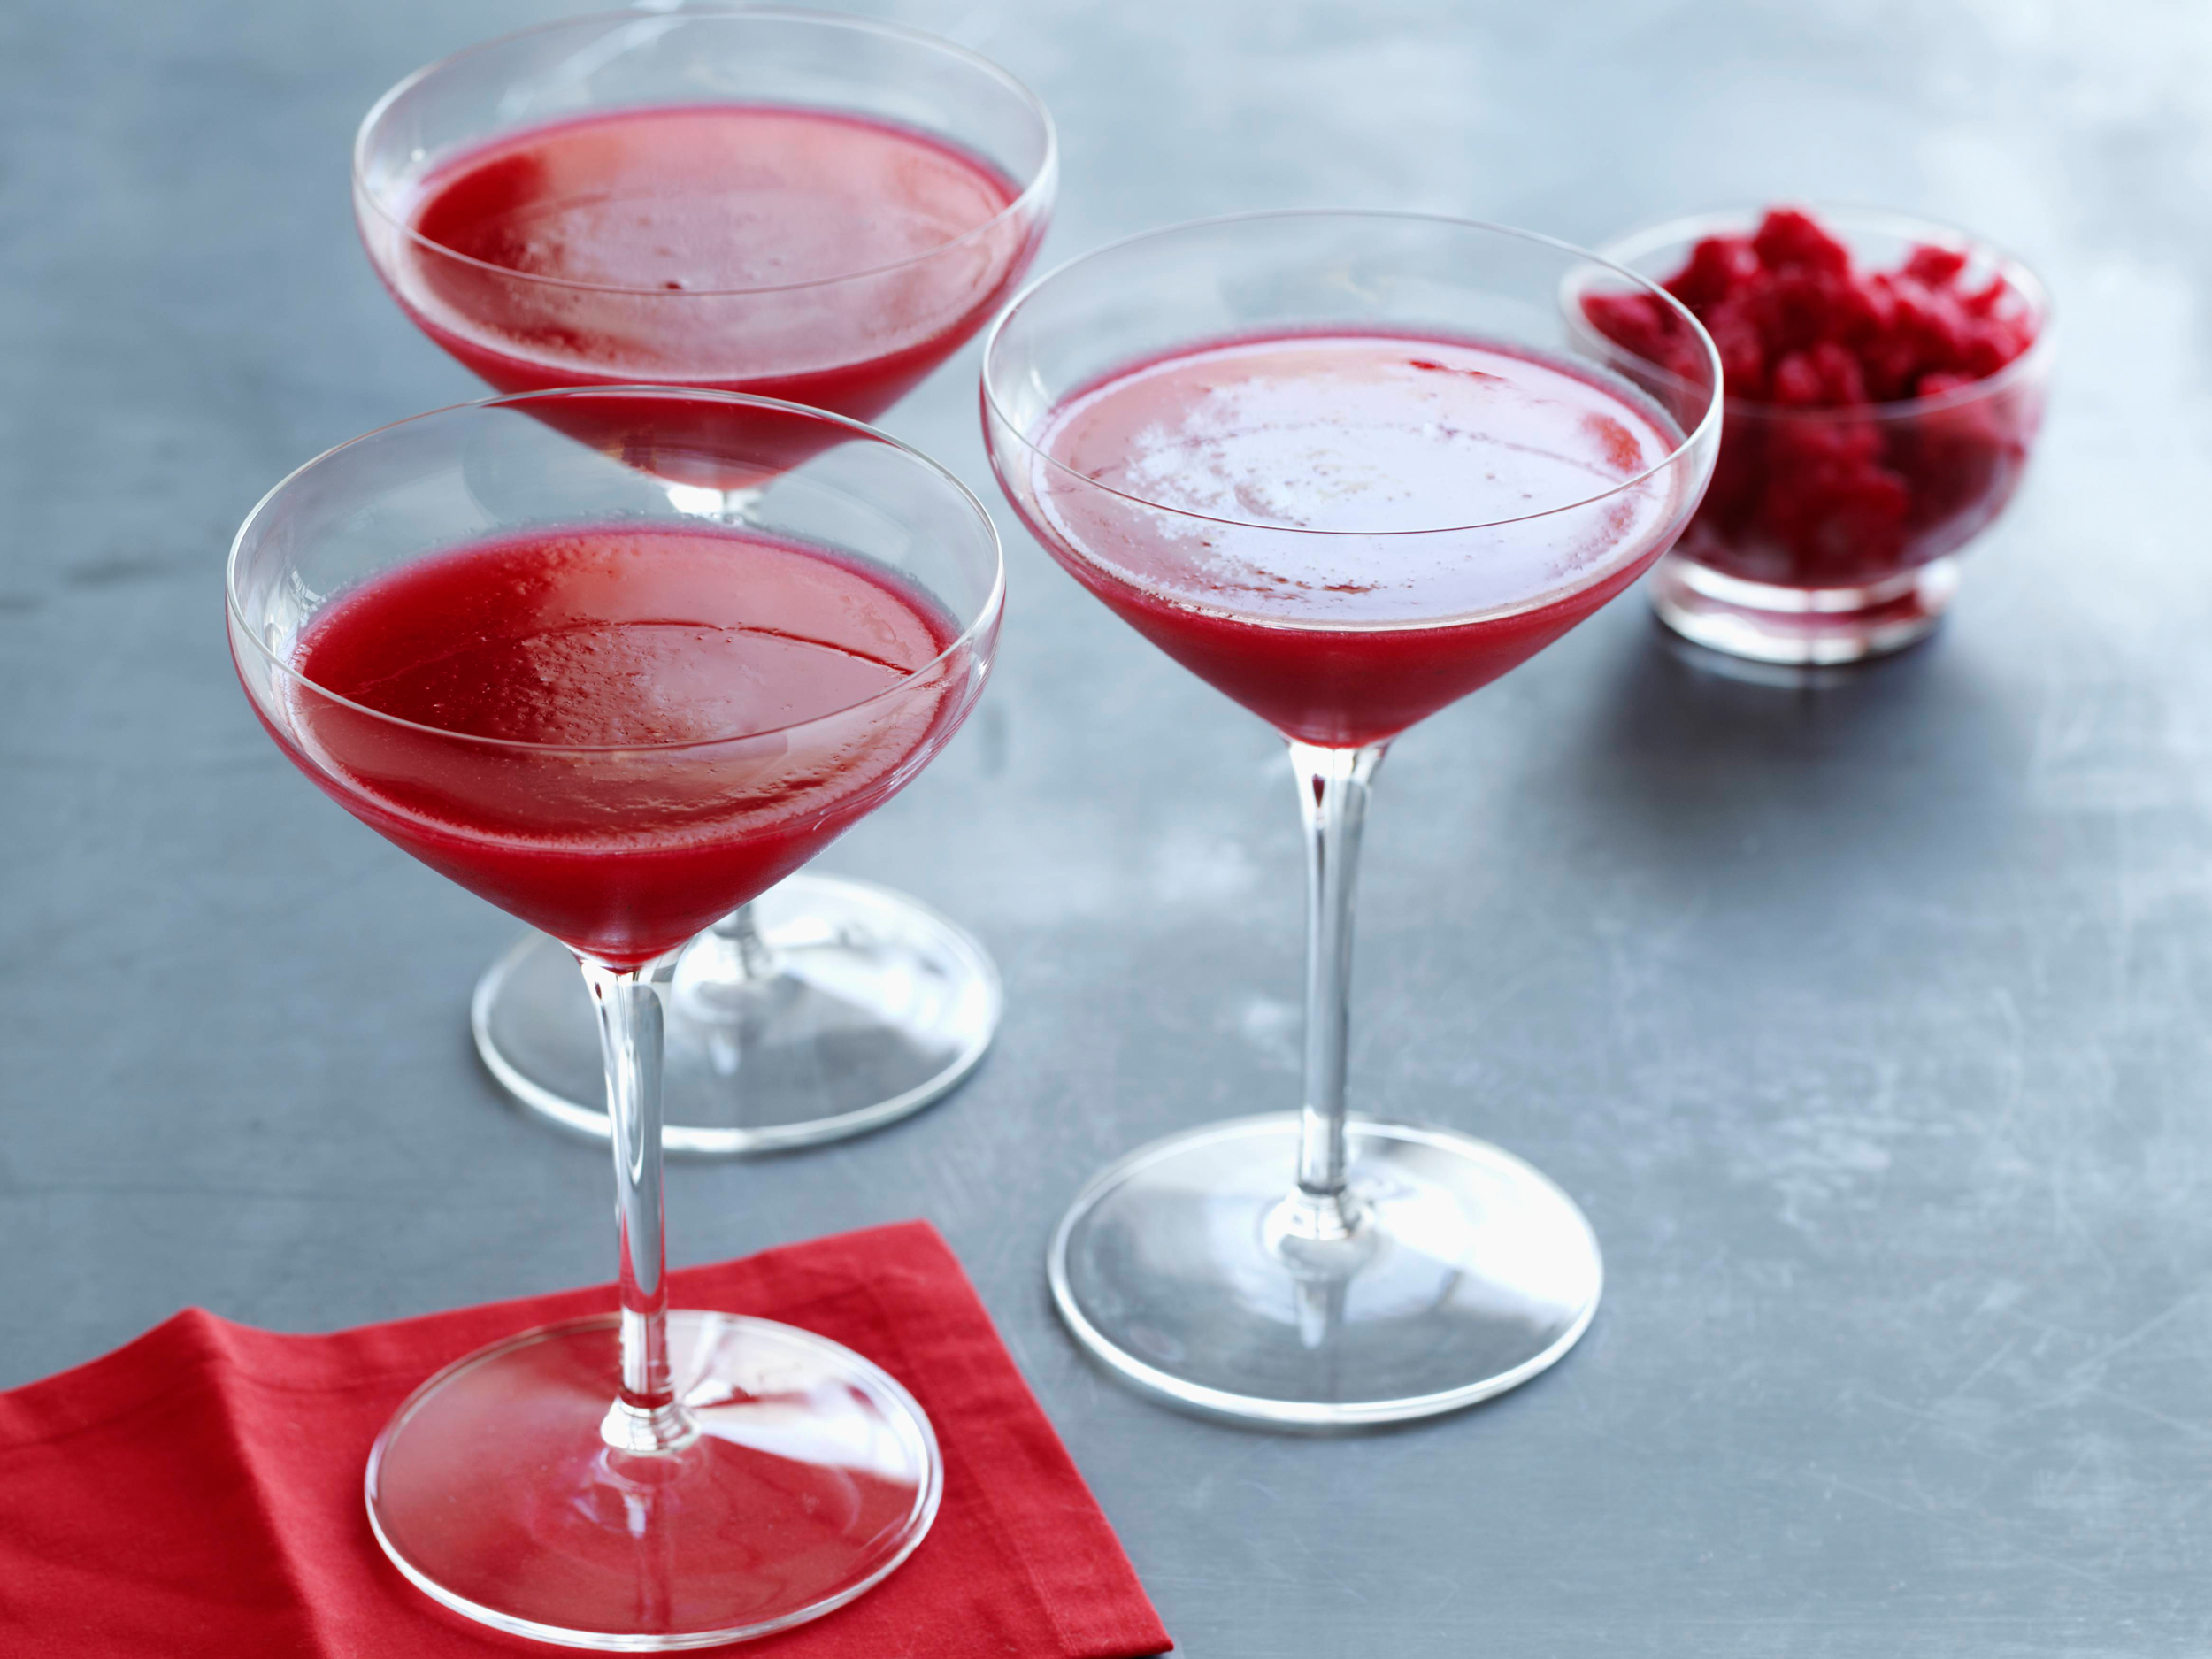 Alton Brown's Fresh Cranberry Cosmo